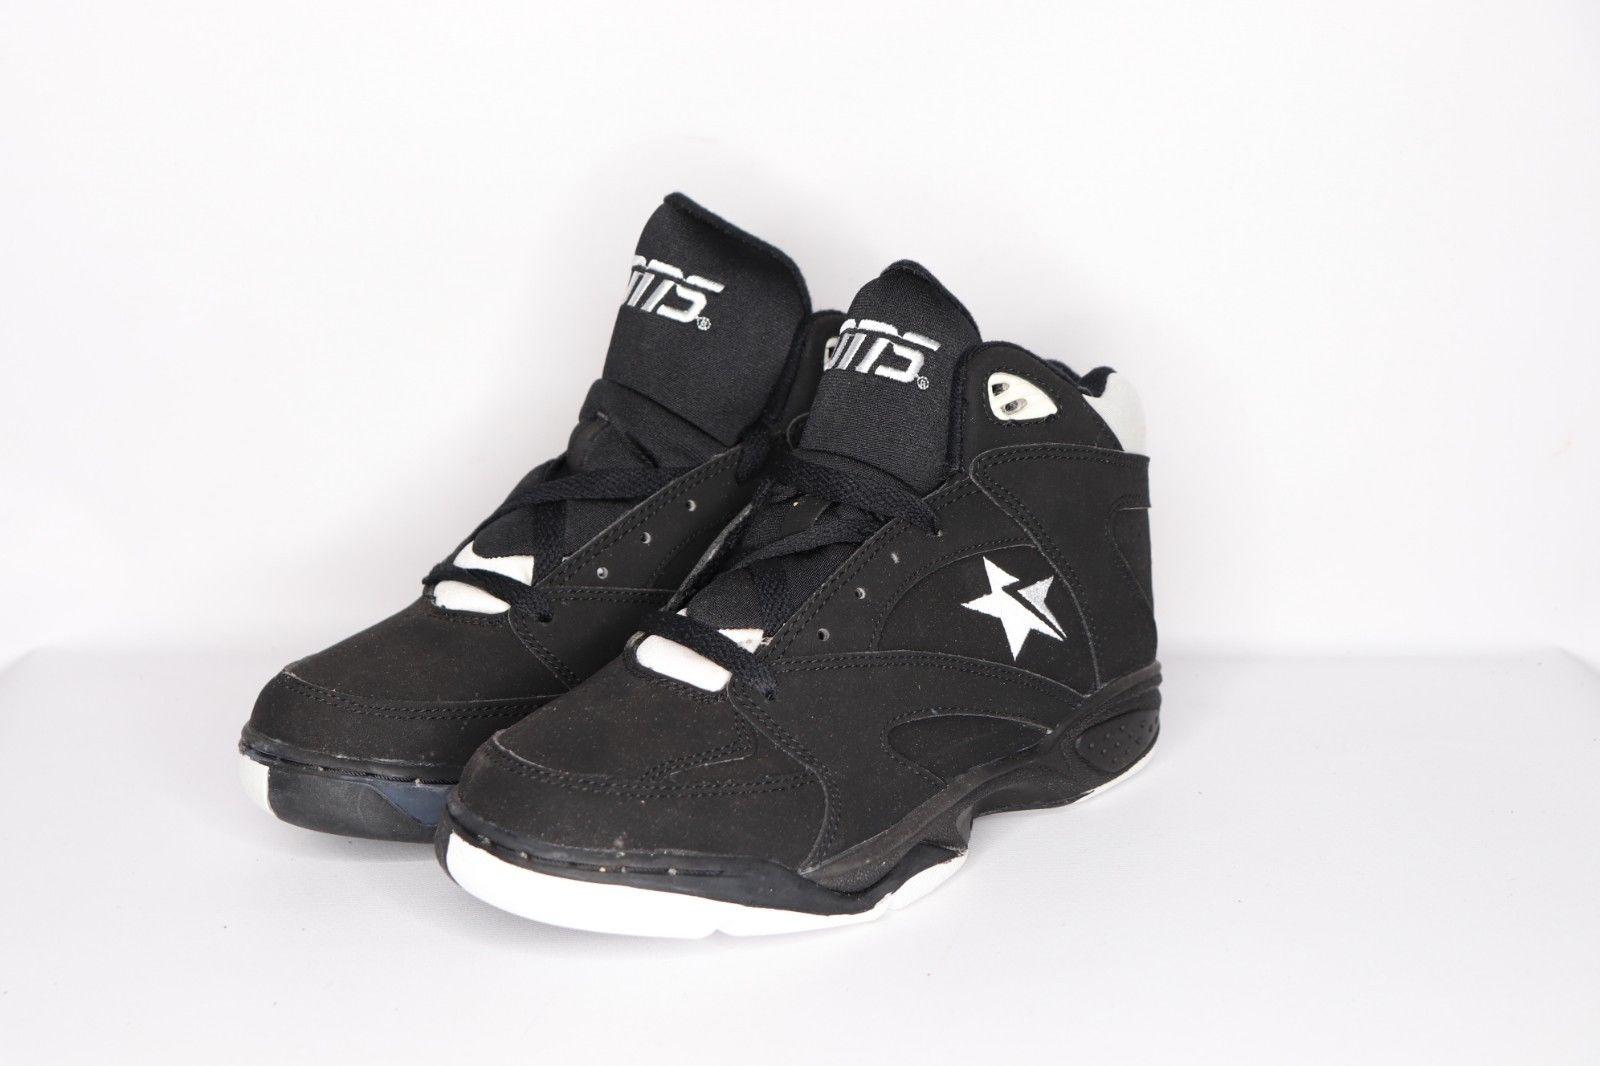 Vintage Vintage 90s New Converse Mens Size 6 Merit Mid Cons Basketball Shoes Black White